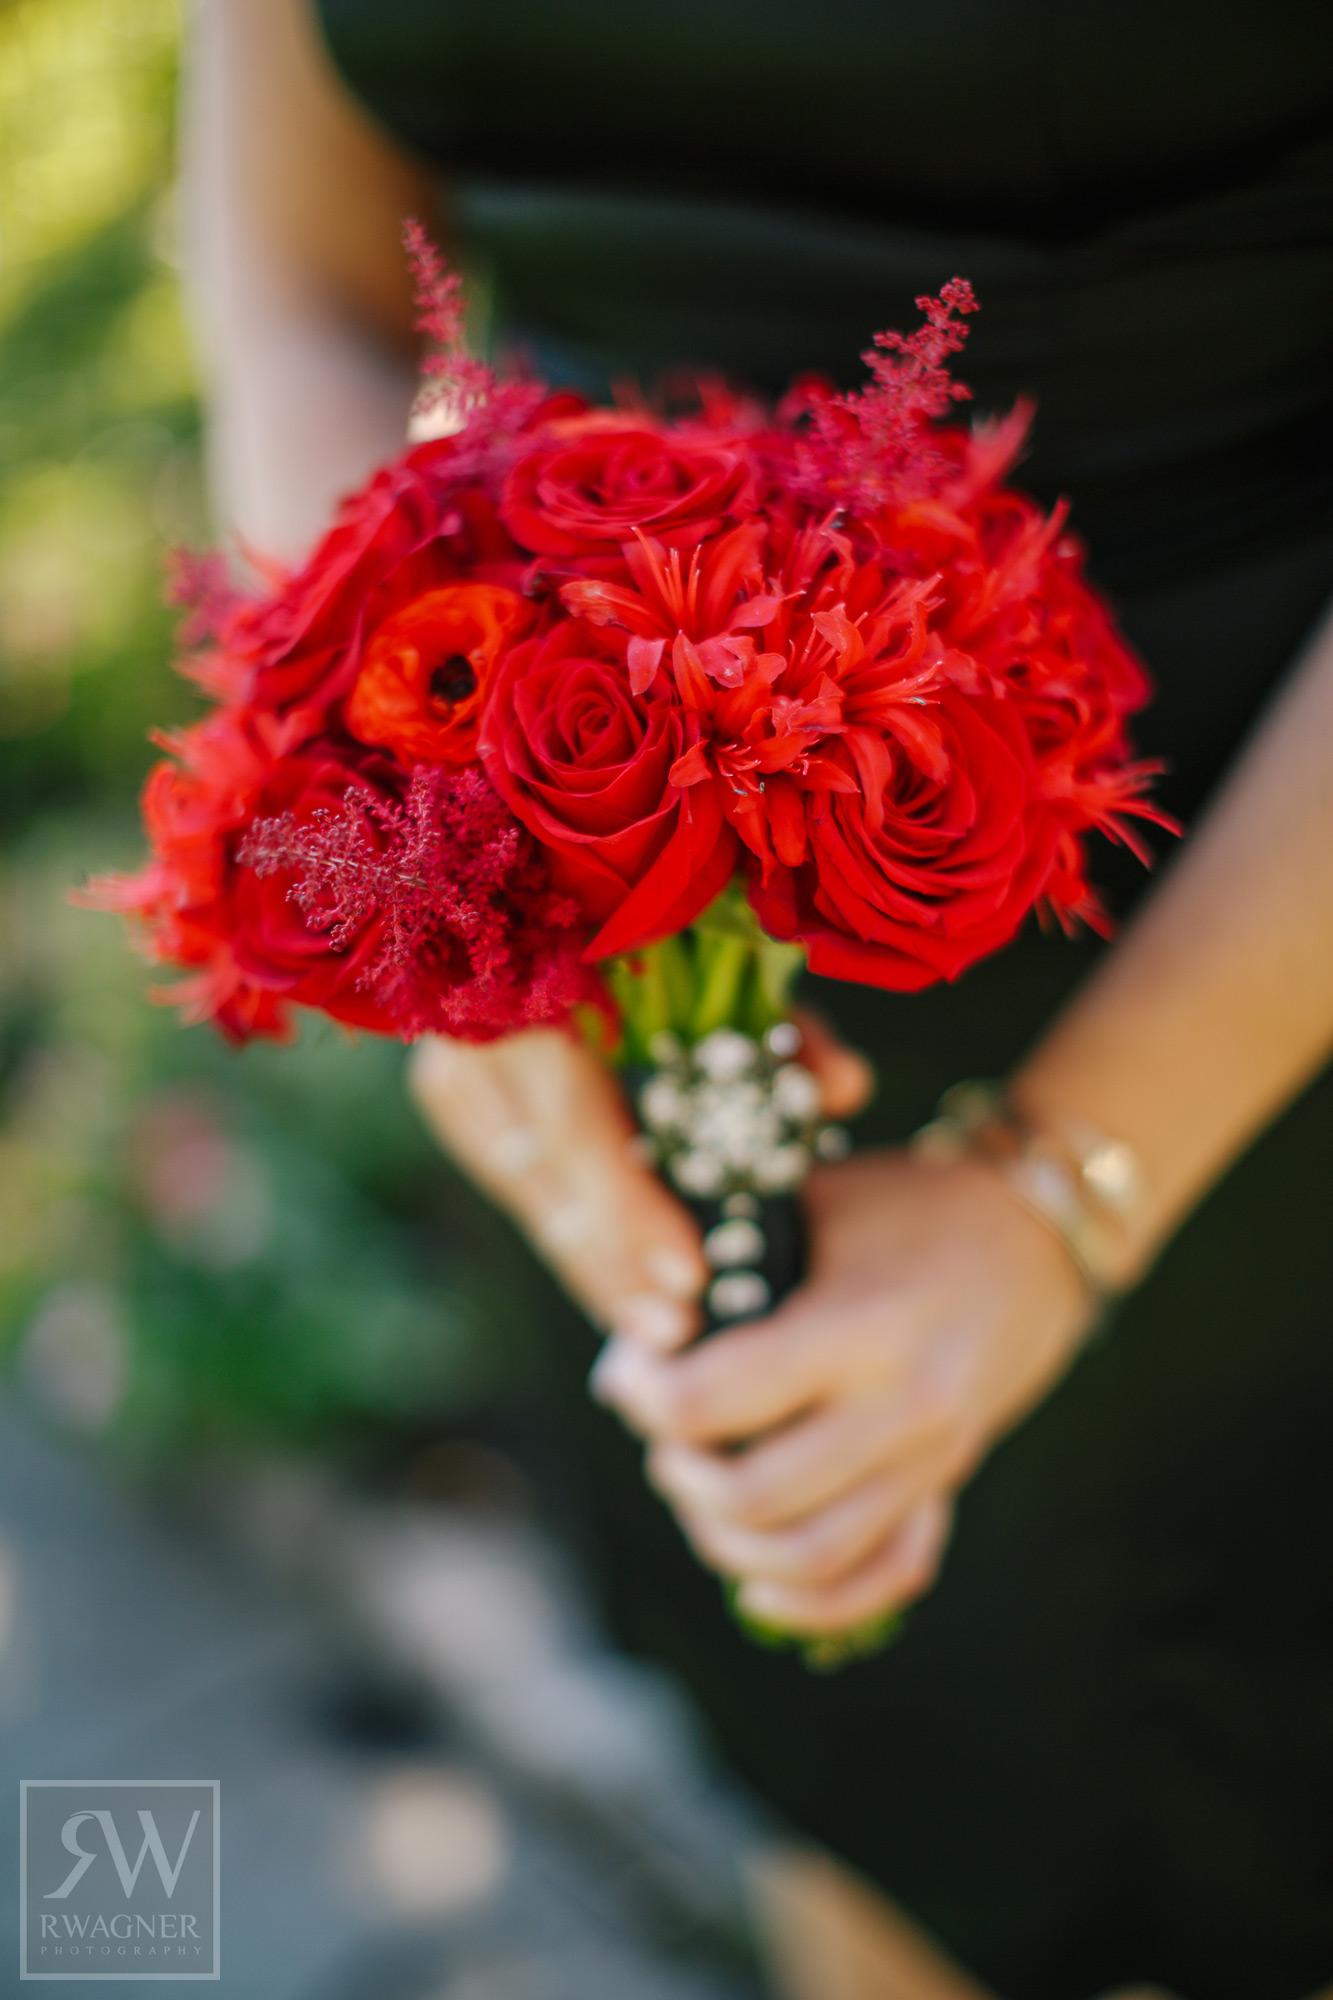 ceci_new_york_luxury_wedding_invitations_couture_red_black_white_real_wedding_dramatic_inn_at_longshore_v286_9.jpg